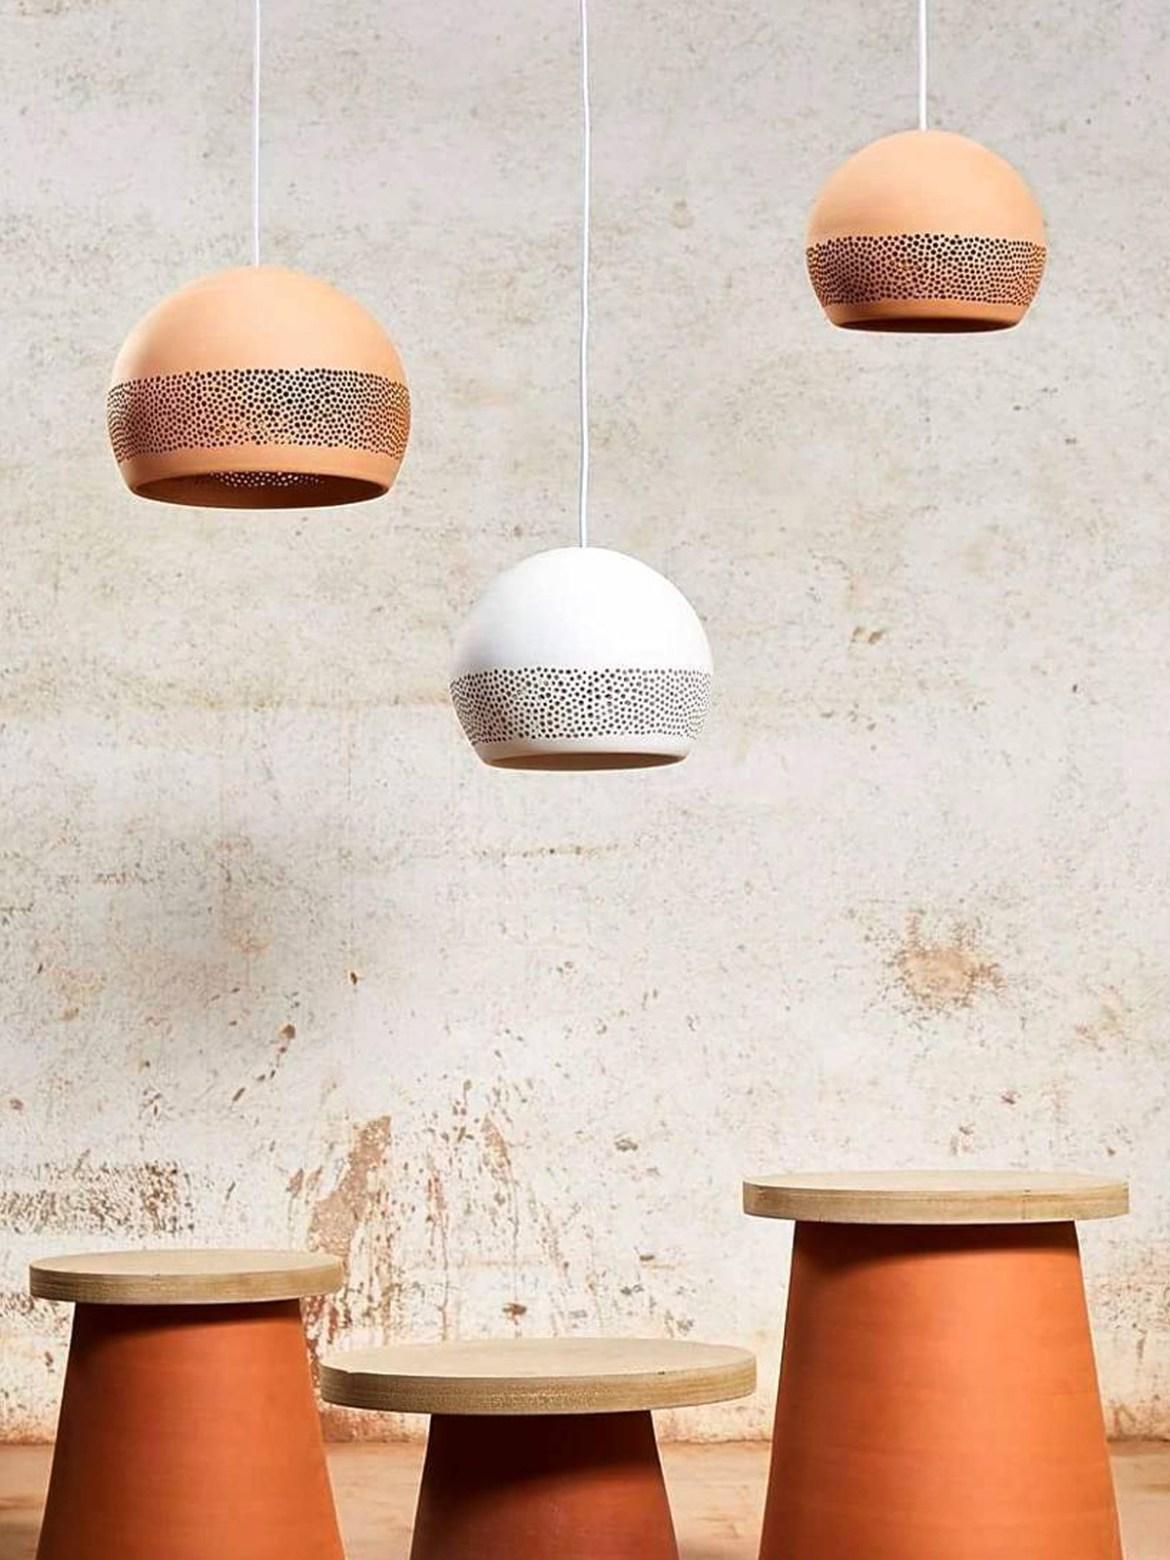 DesignOrt Blog: Pendelleuchten aus Keramik SpongeRo! von Pott DesignOrt